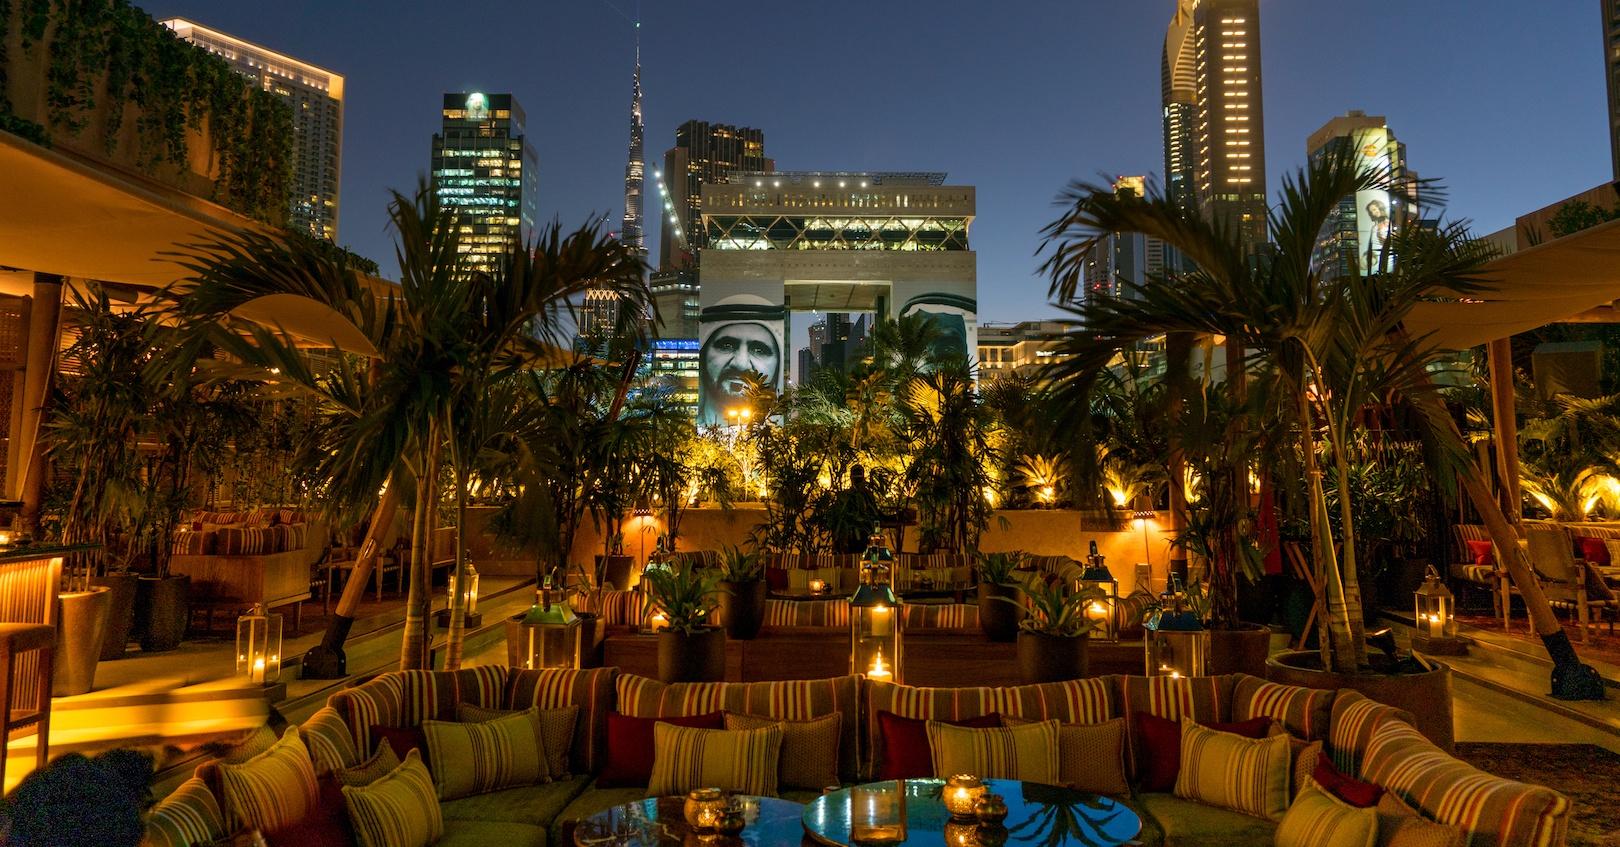 Ninive: new Middle Eastern restaurant in Dubai